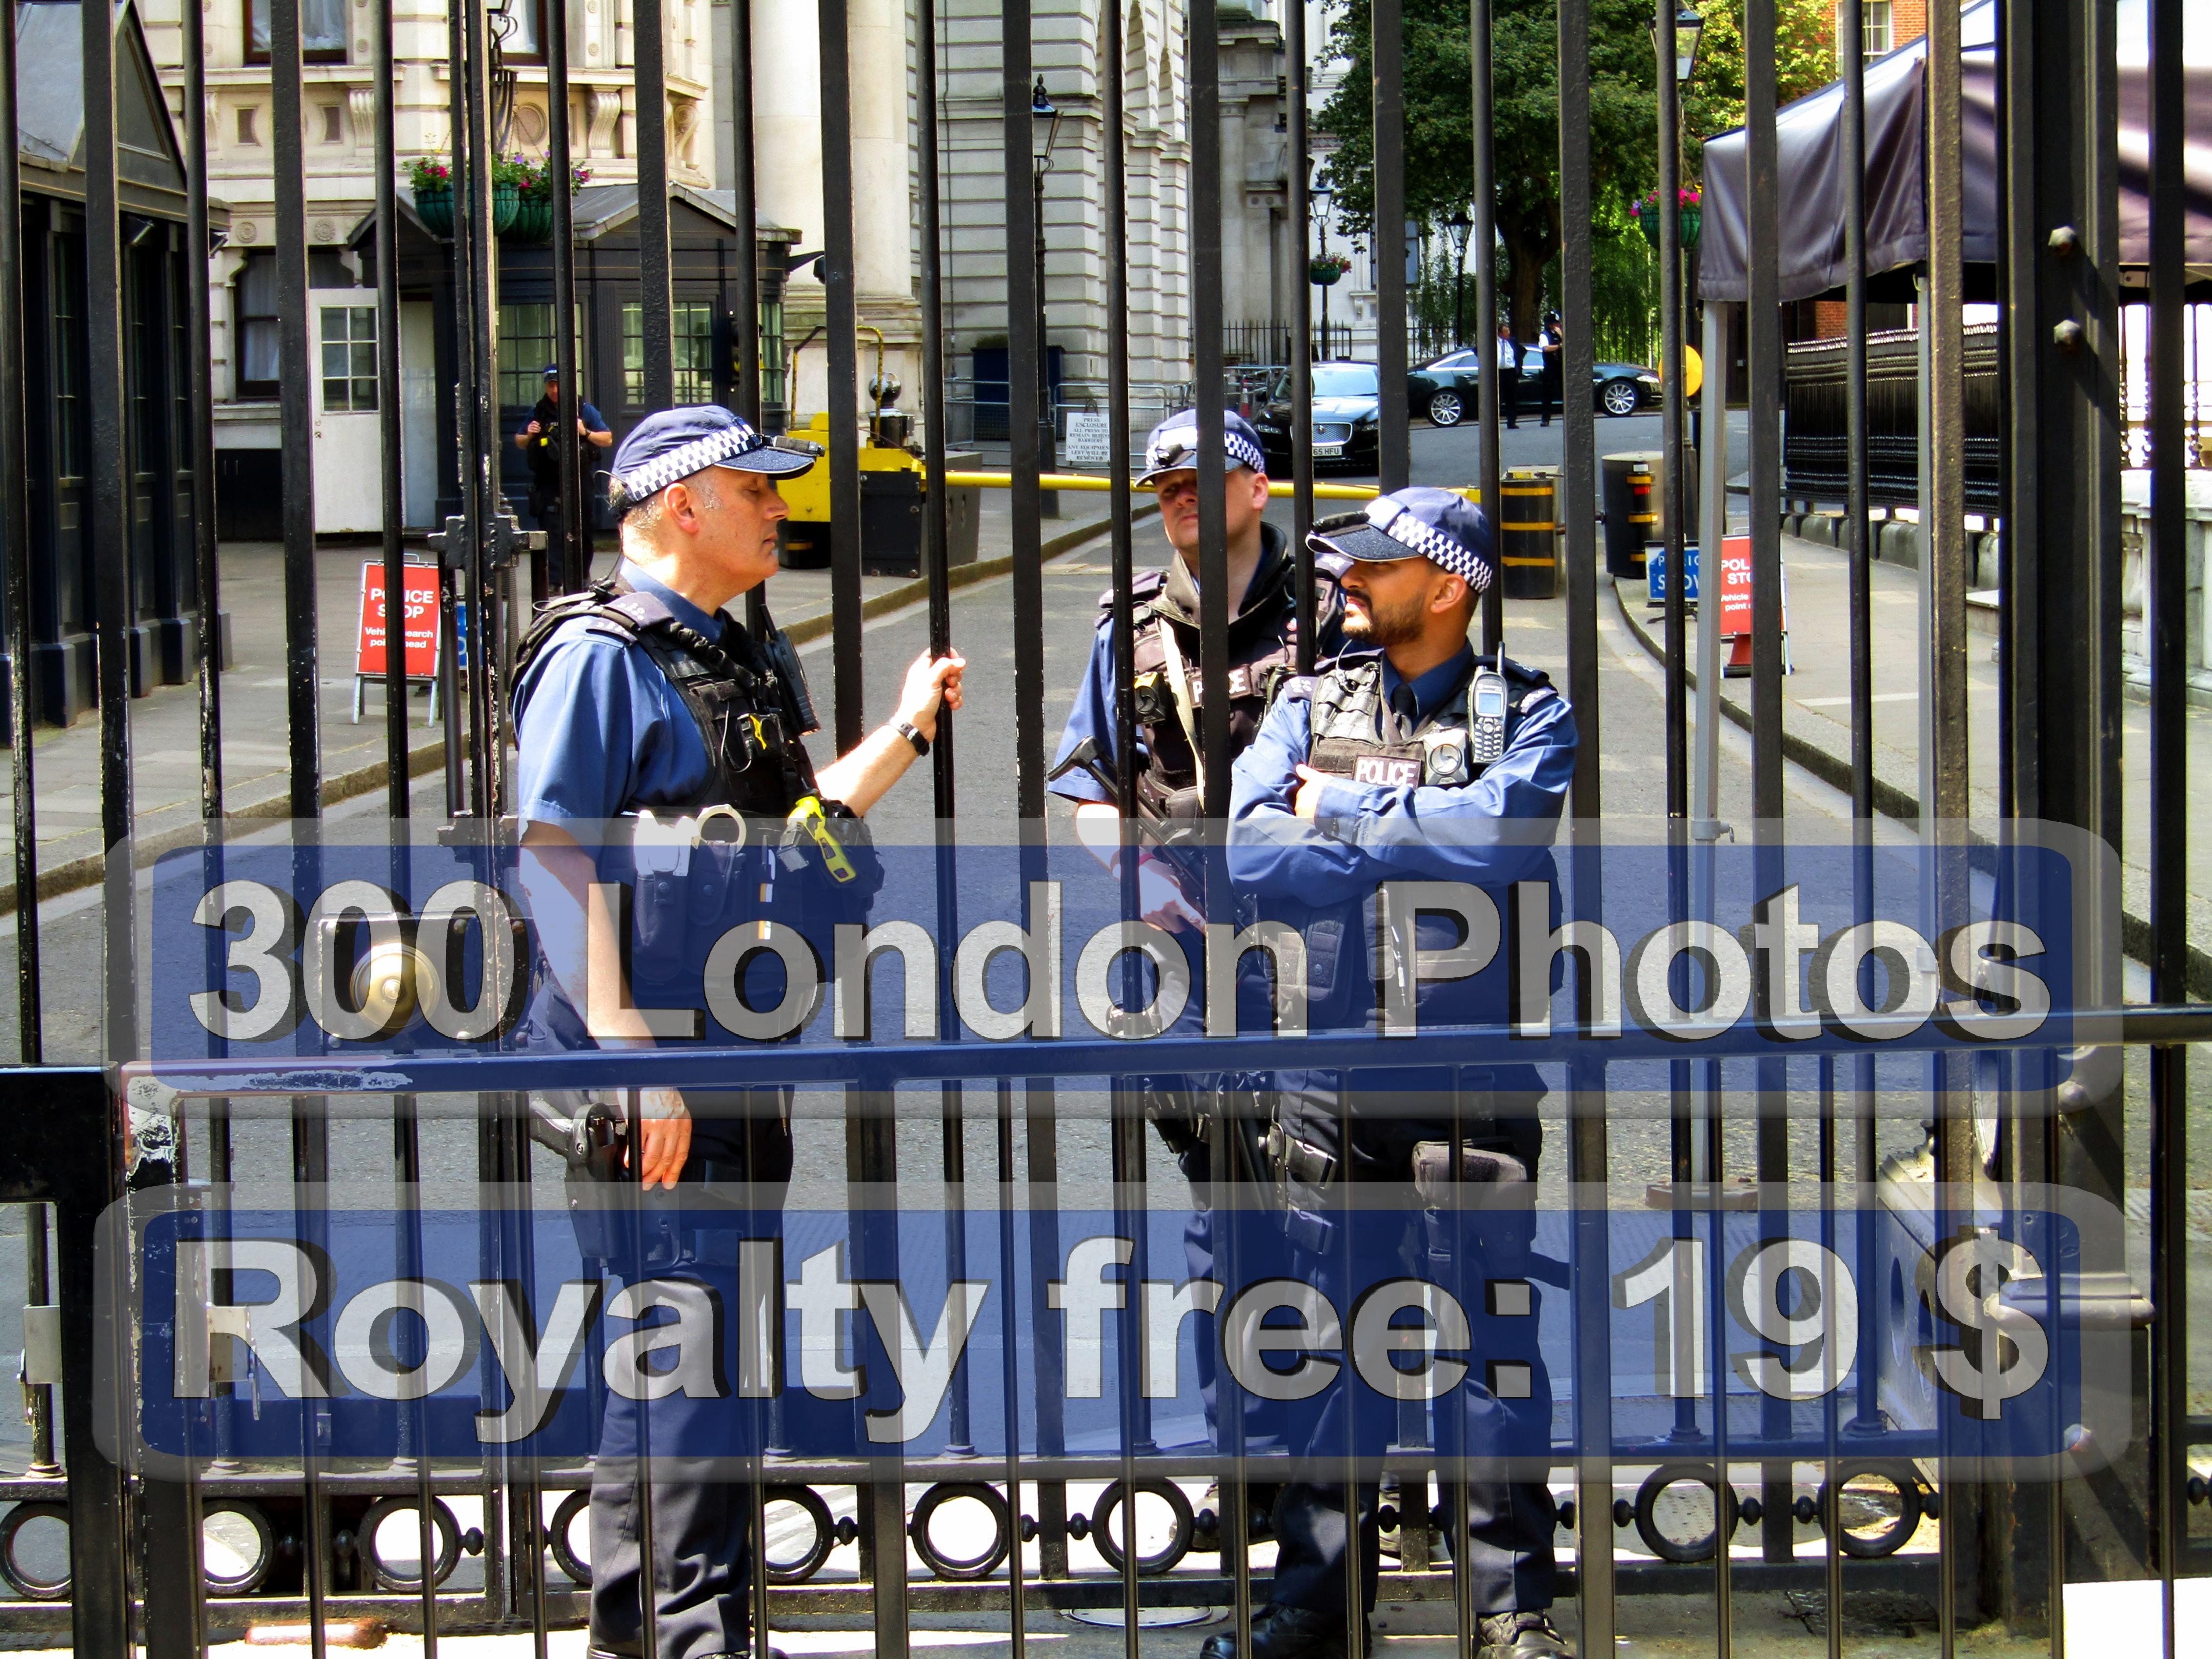 London Photo Club